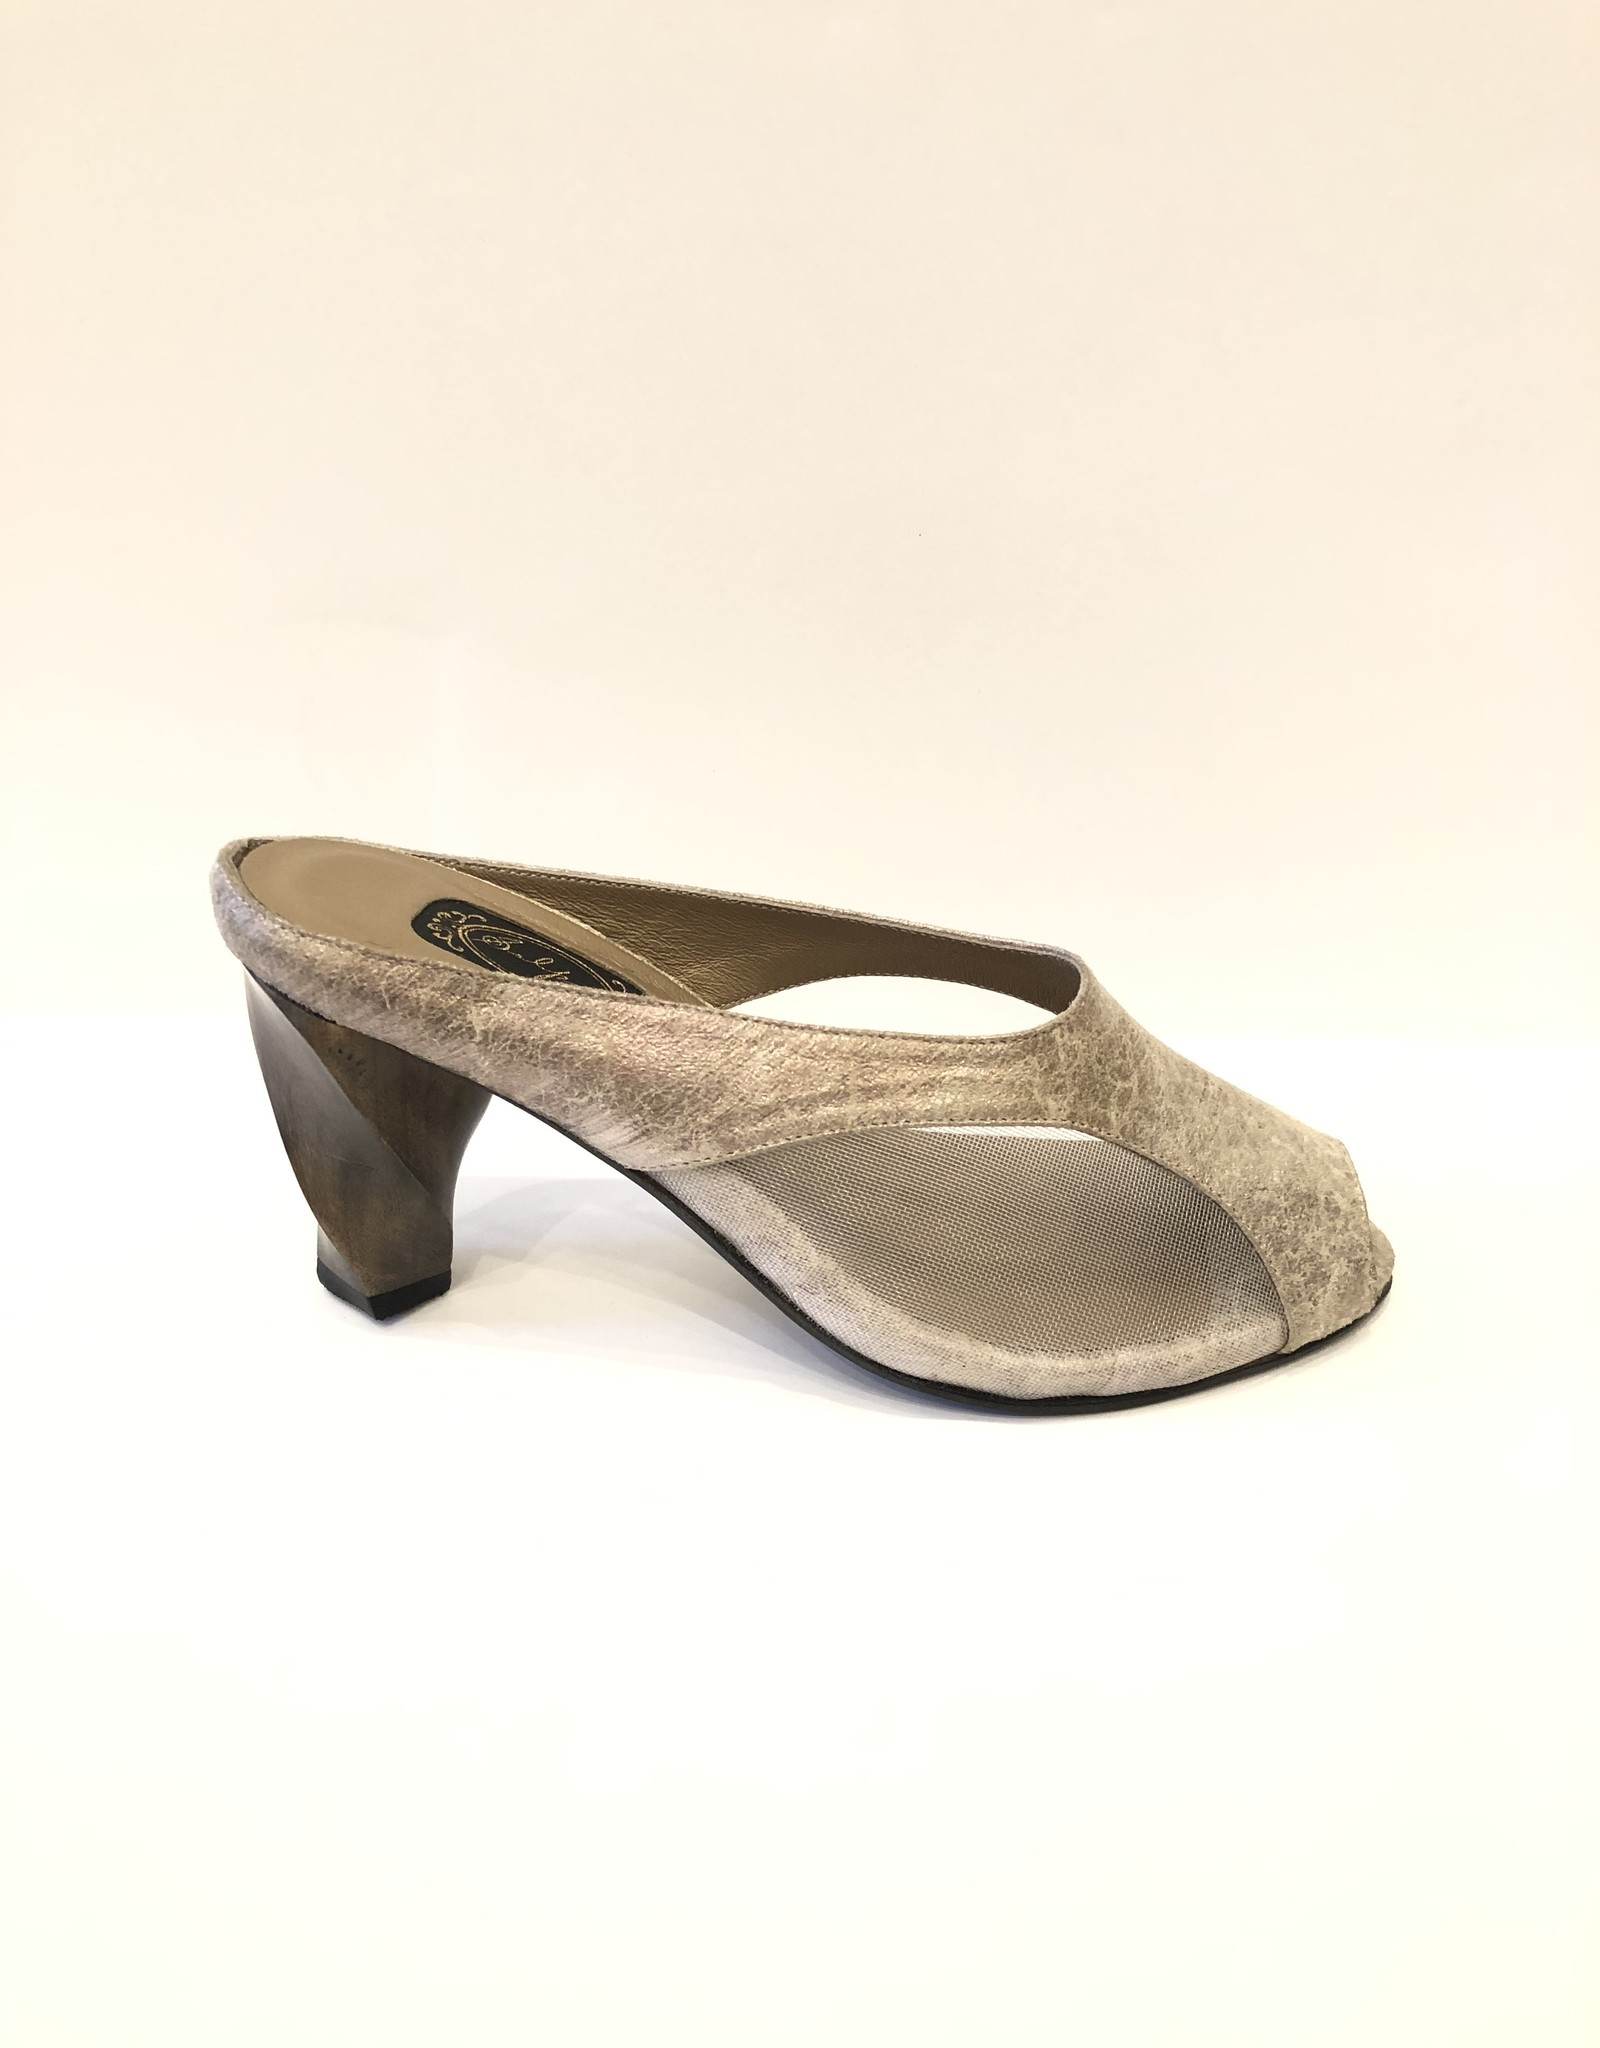 SALPY - Nora Peep Toe